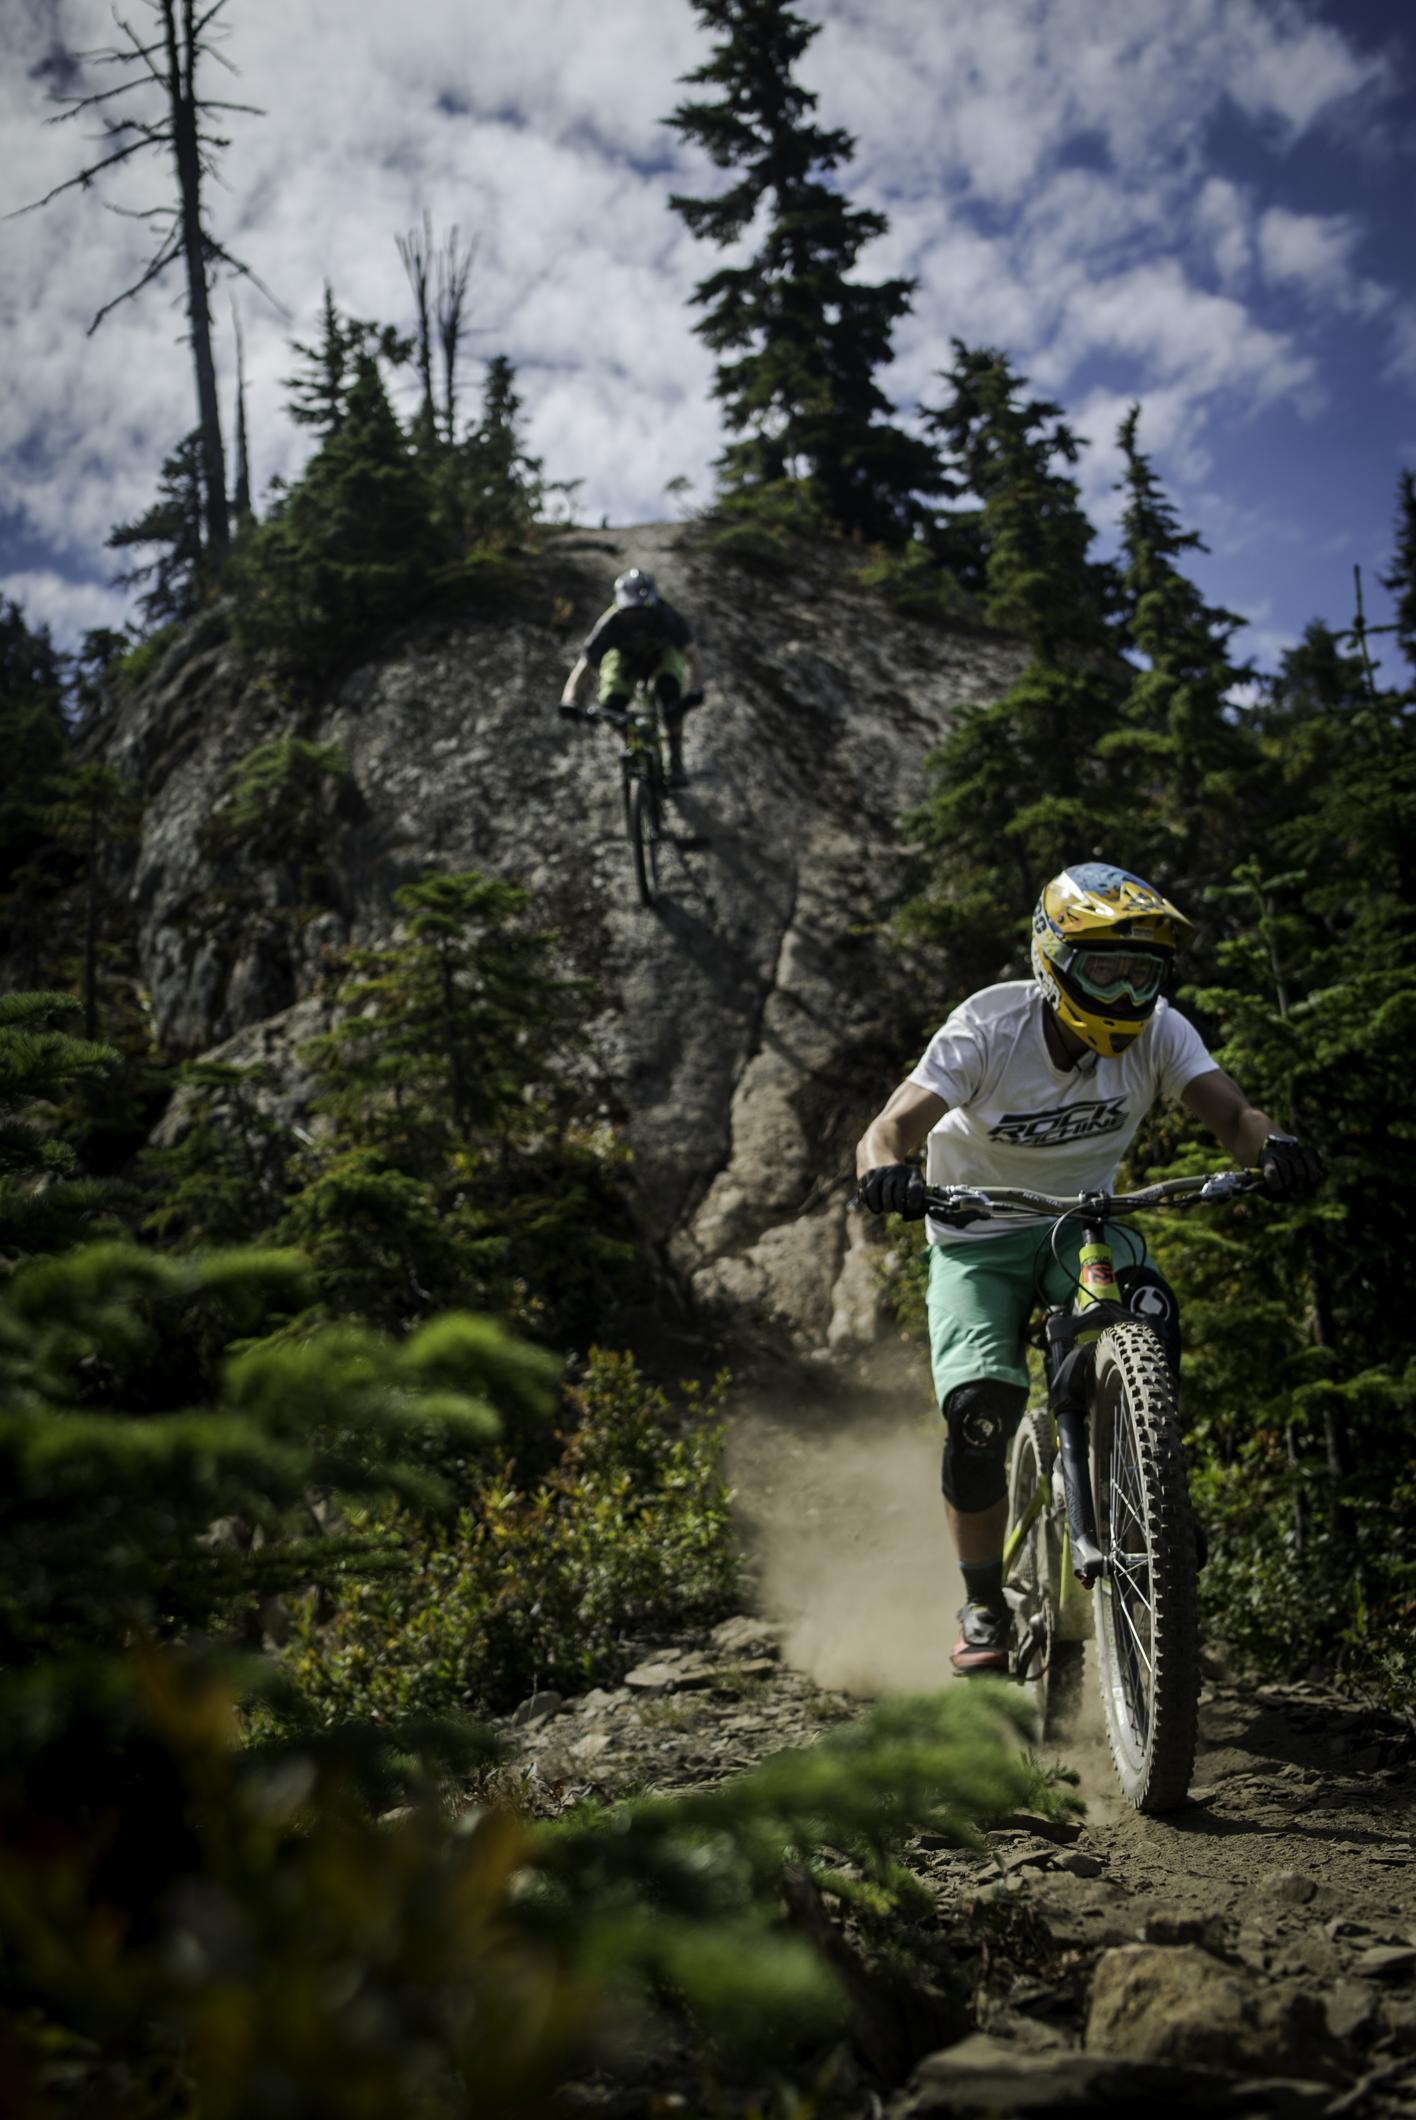 Kluci steep rock